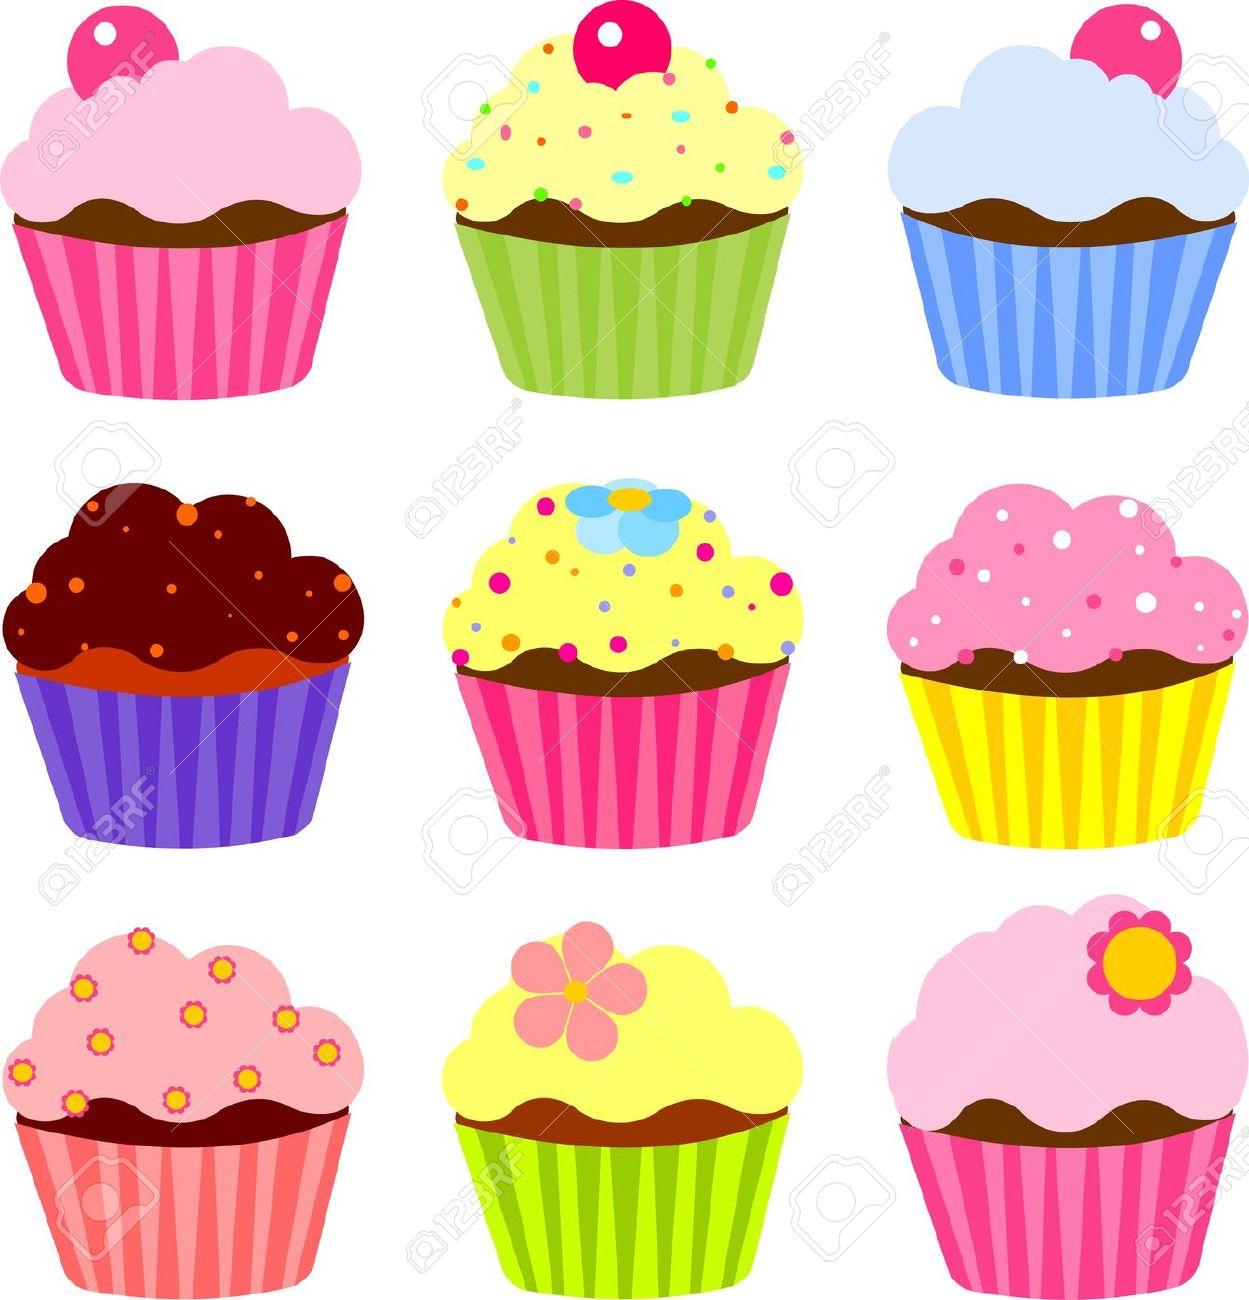 Cupcakes fotolip com rich. Baking clipart cupcake